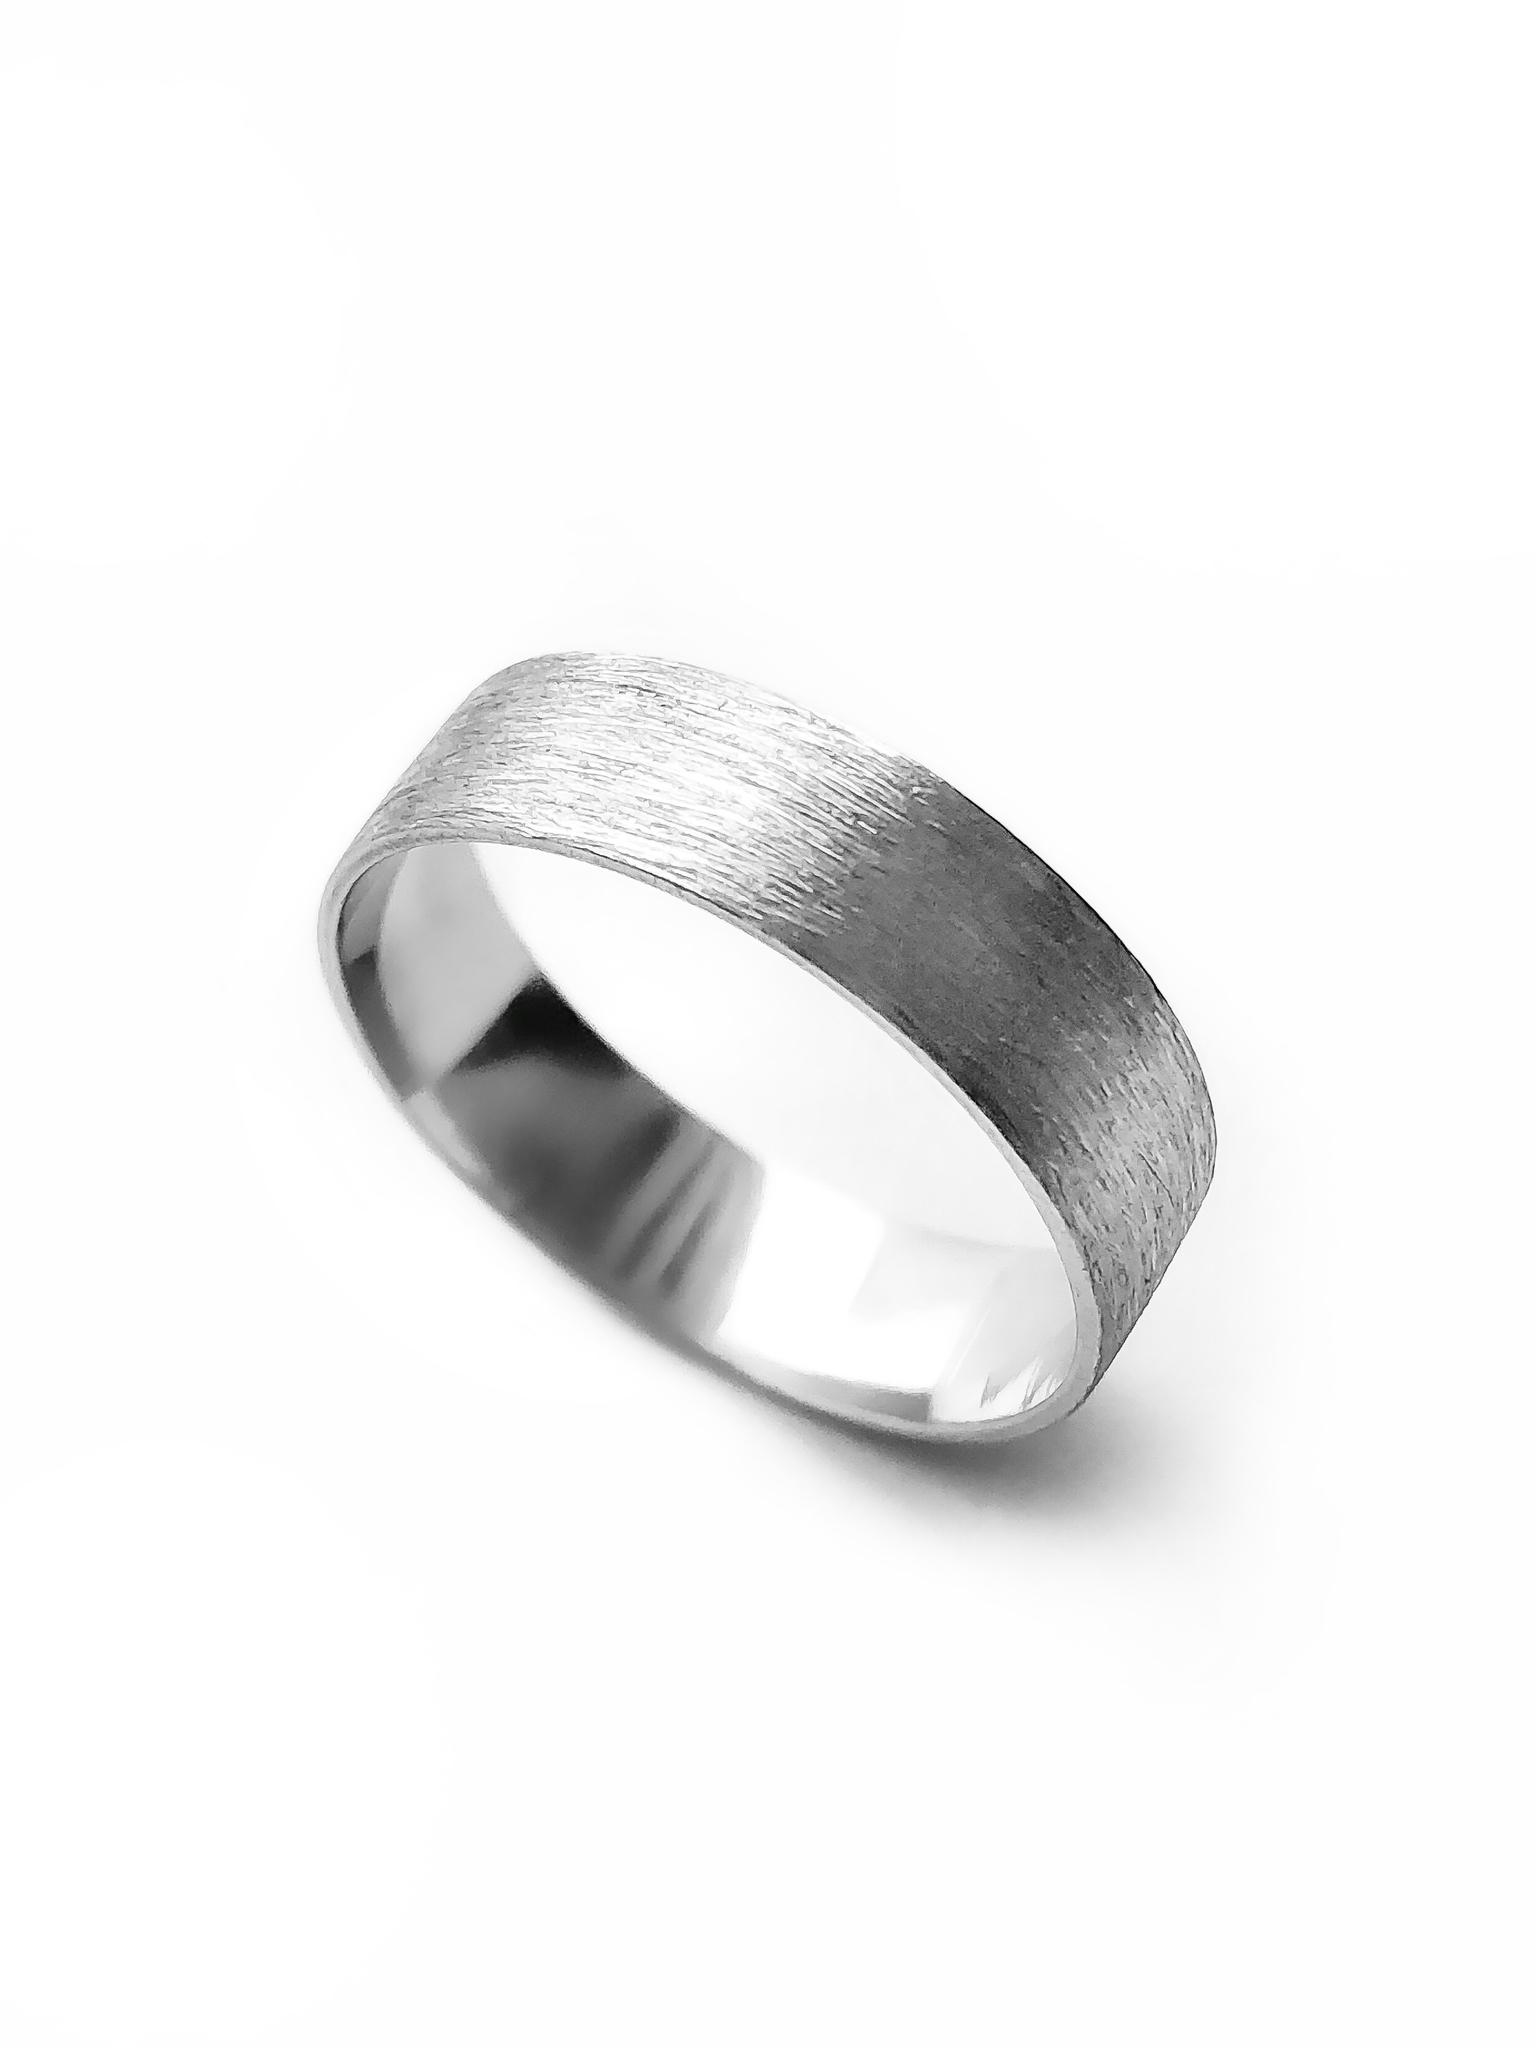 Серебряное кольцо 5 мм сатиновое